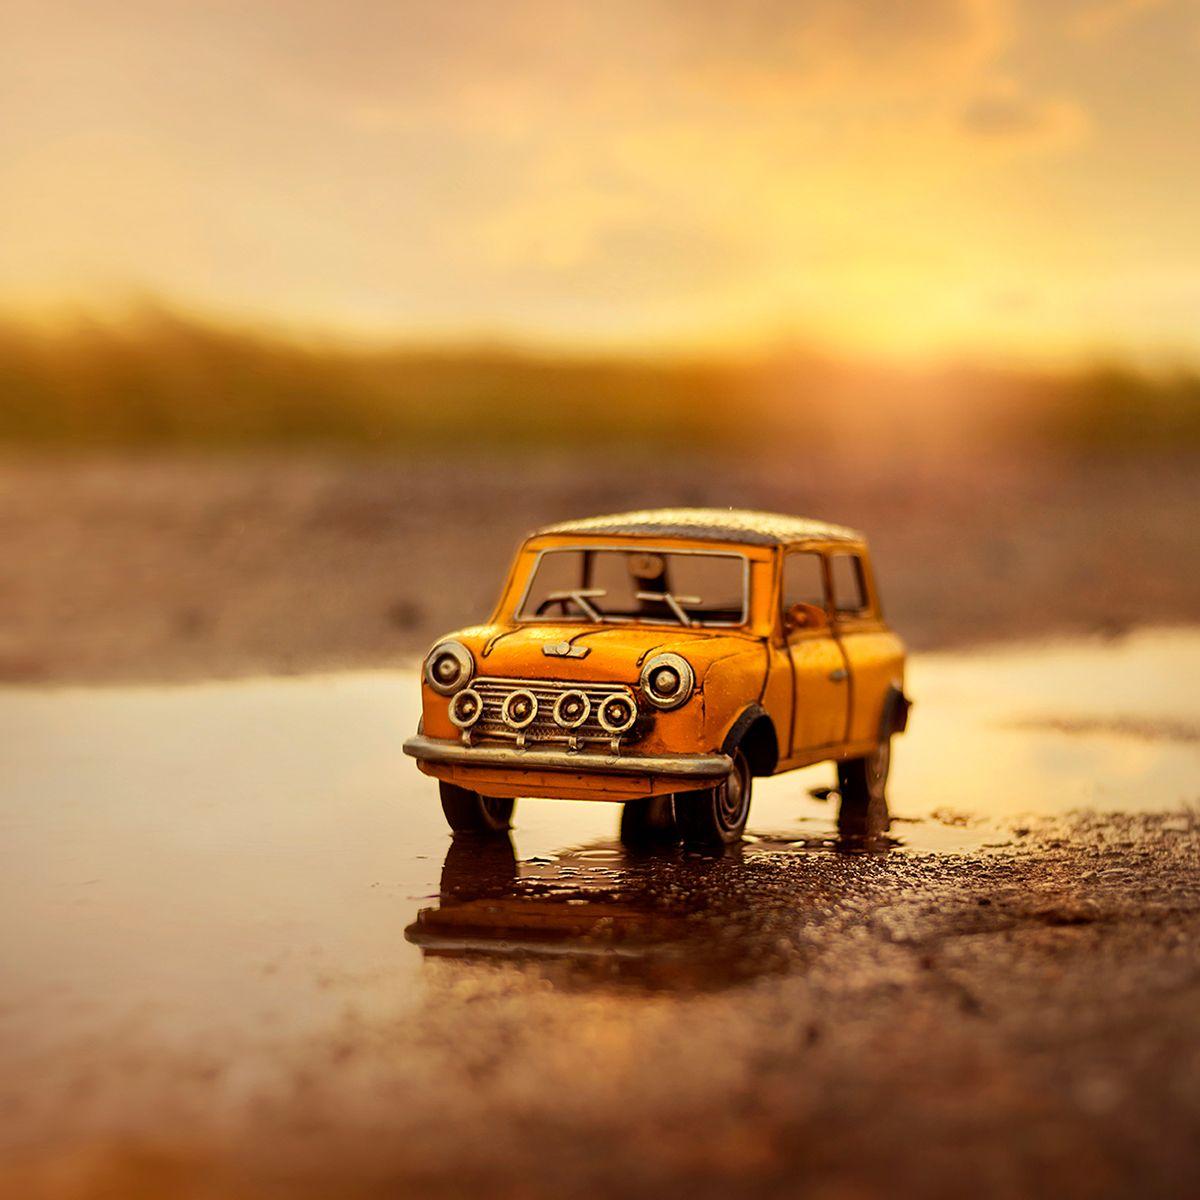 My miniature cars photography series. | миниатюра | Pinterest ...